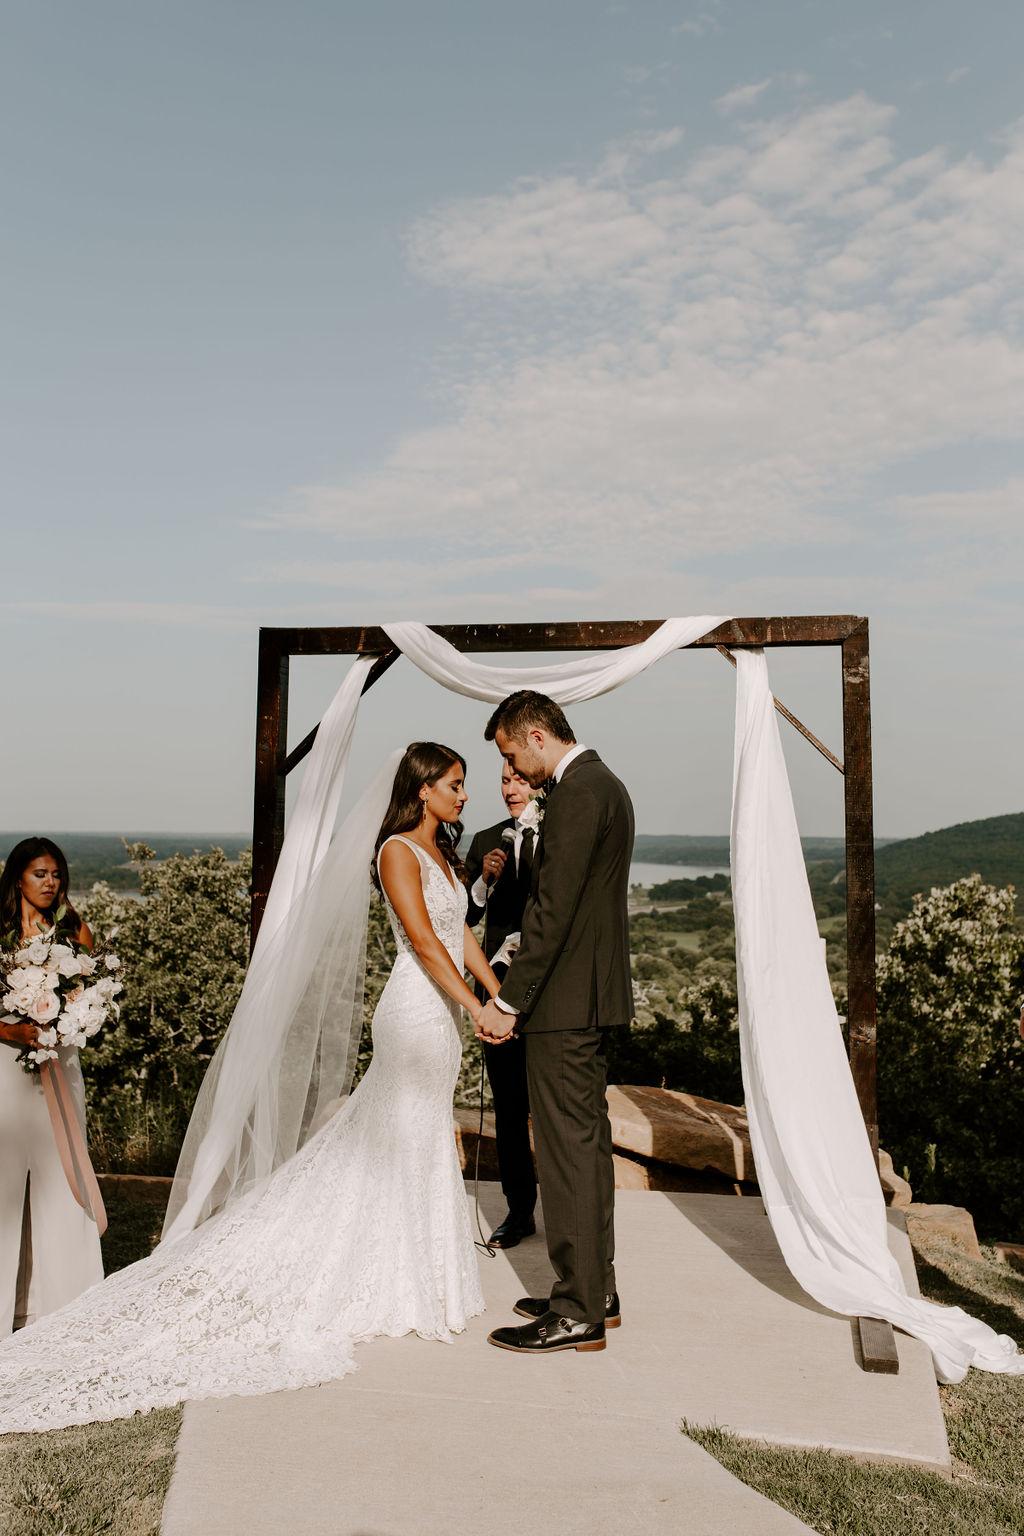 Tulsa White Barn Wedding Venue Outdoor Ceremony 73.jpg